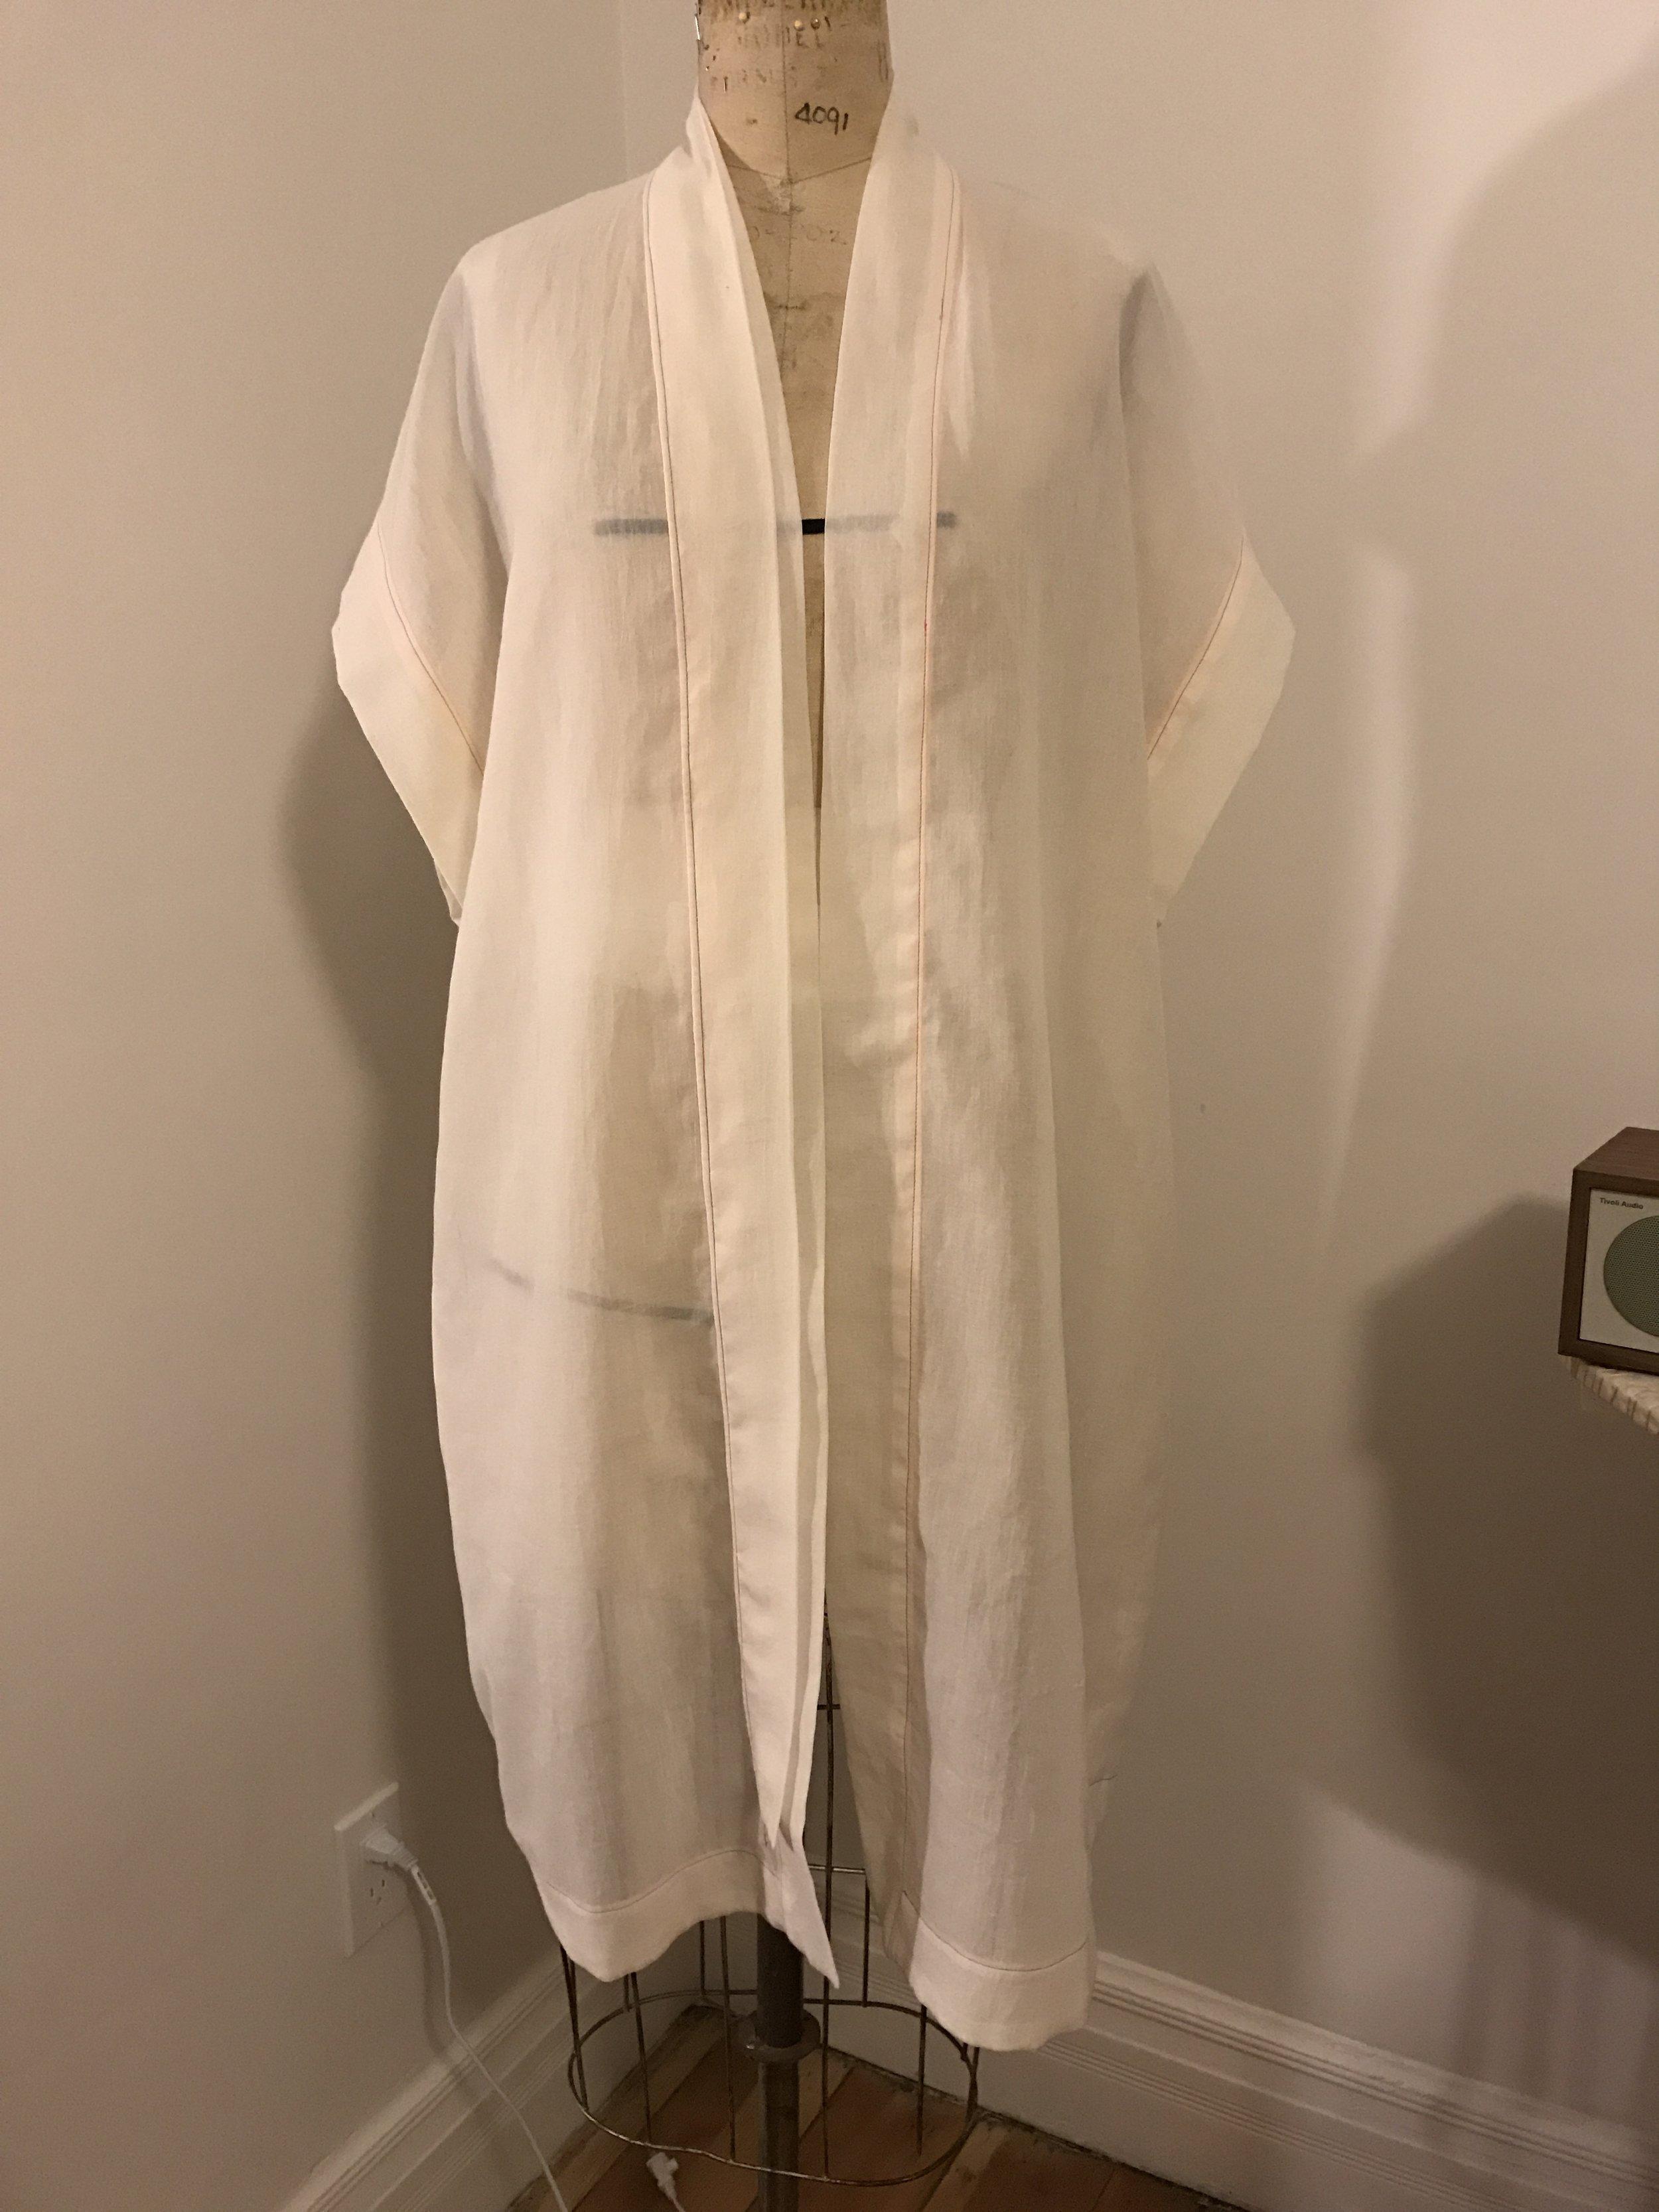 A kimono test proto: pattern drafting and garment construction